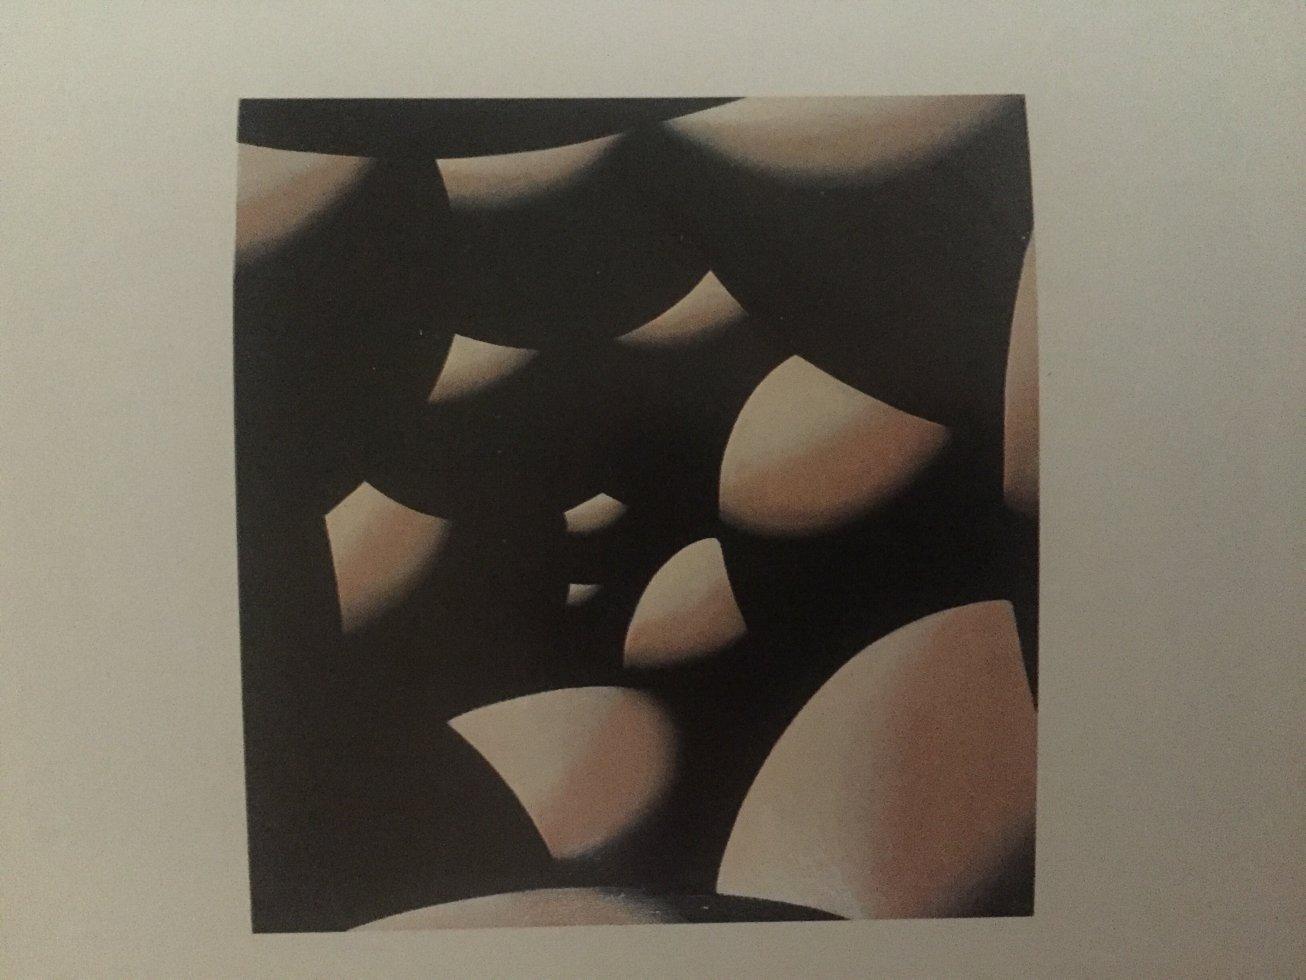 S/T (1991) - Thomas Jocher